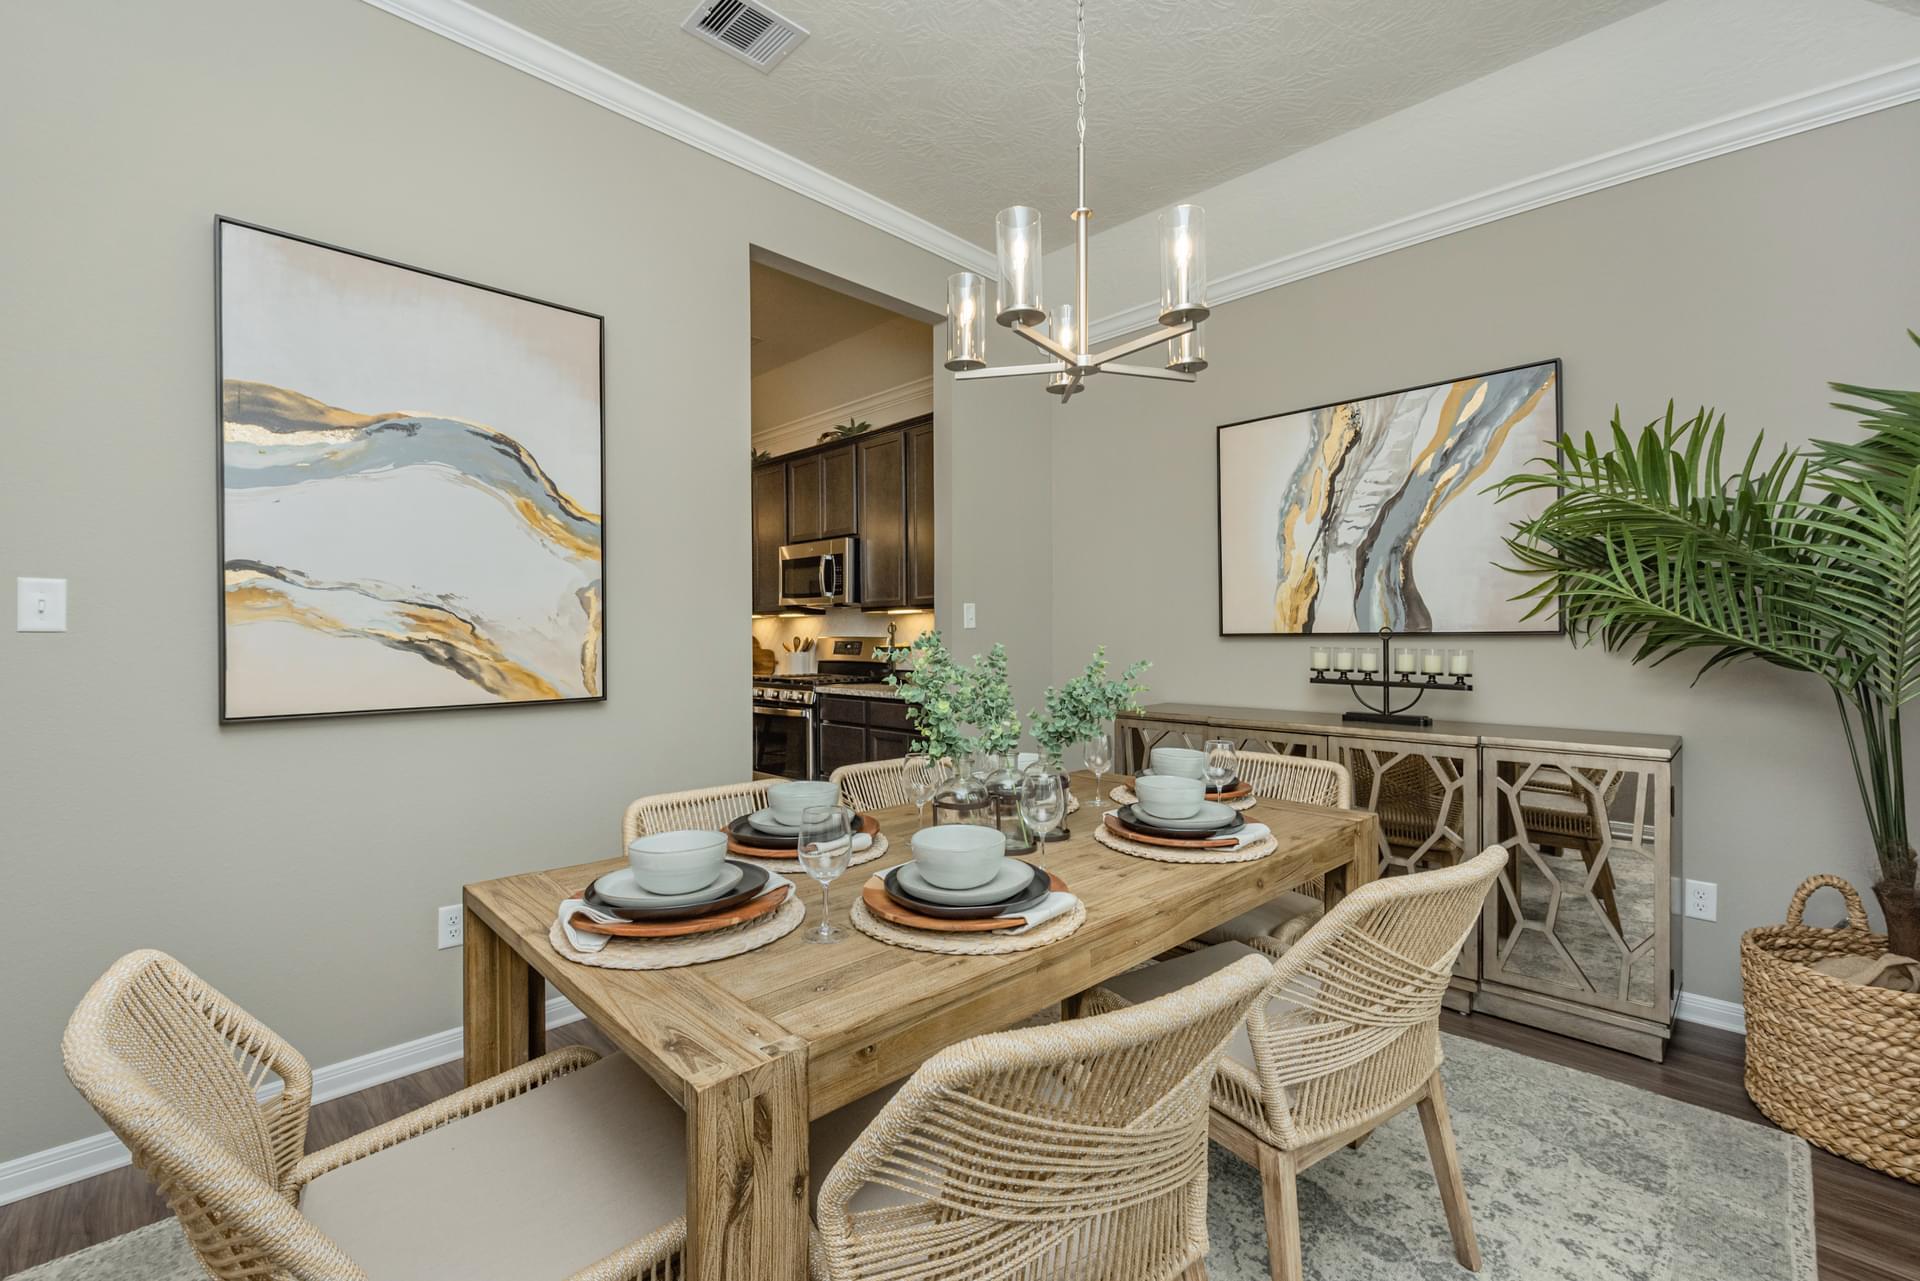 New Home in Belton, TX